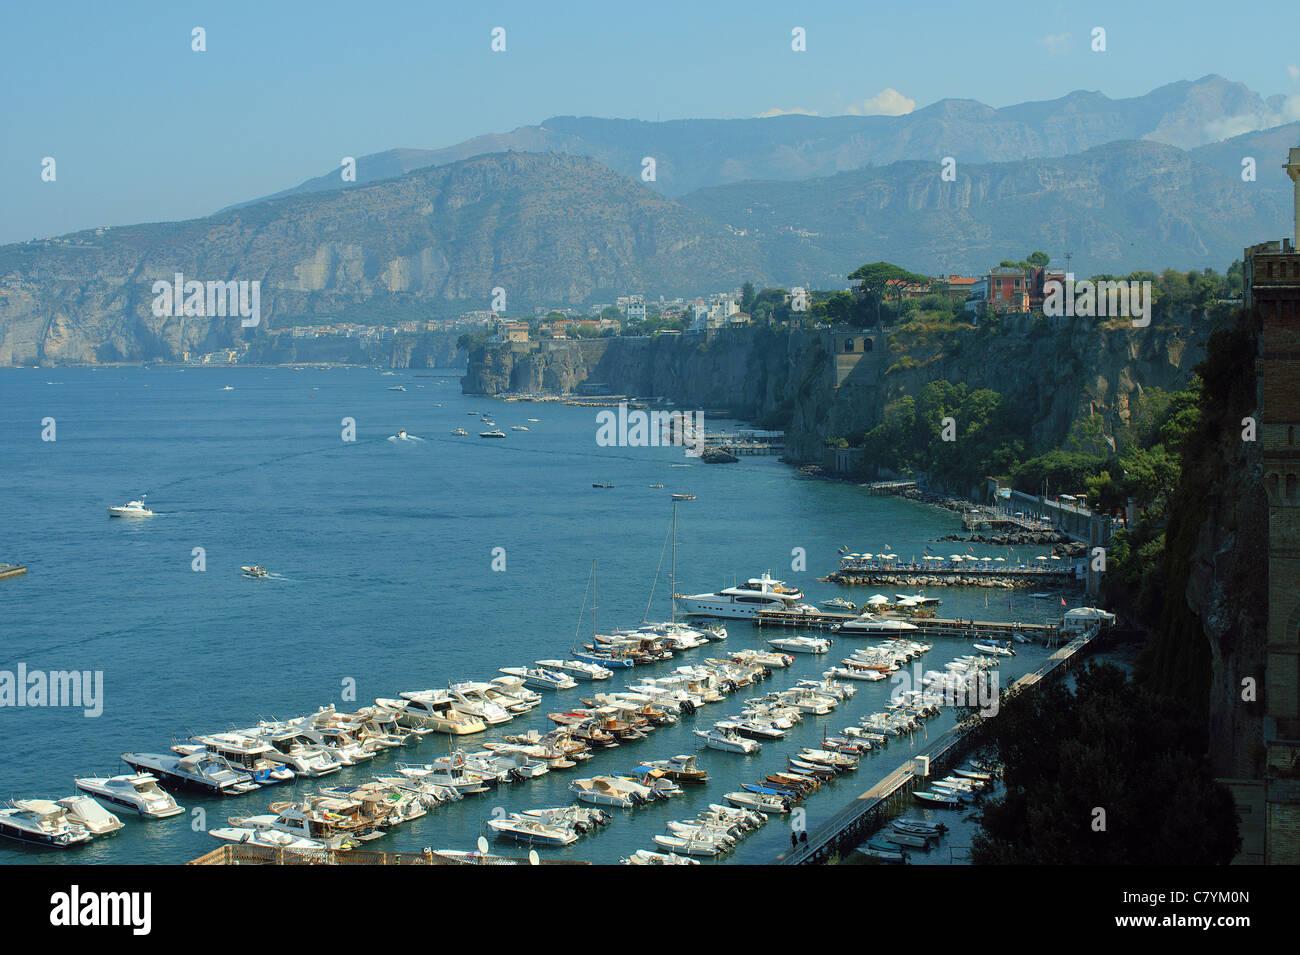 Port of Sorrento Italy Gulf of Naples Bay - Stock Image